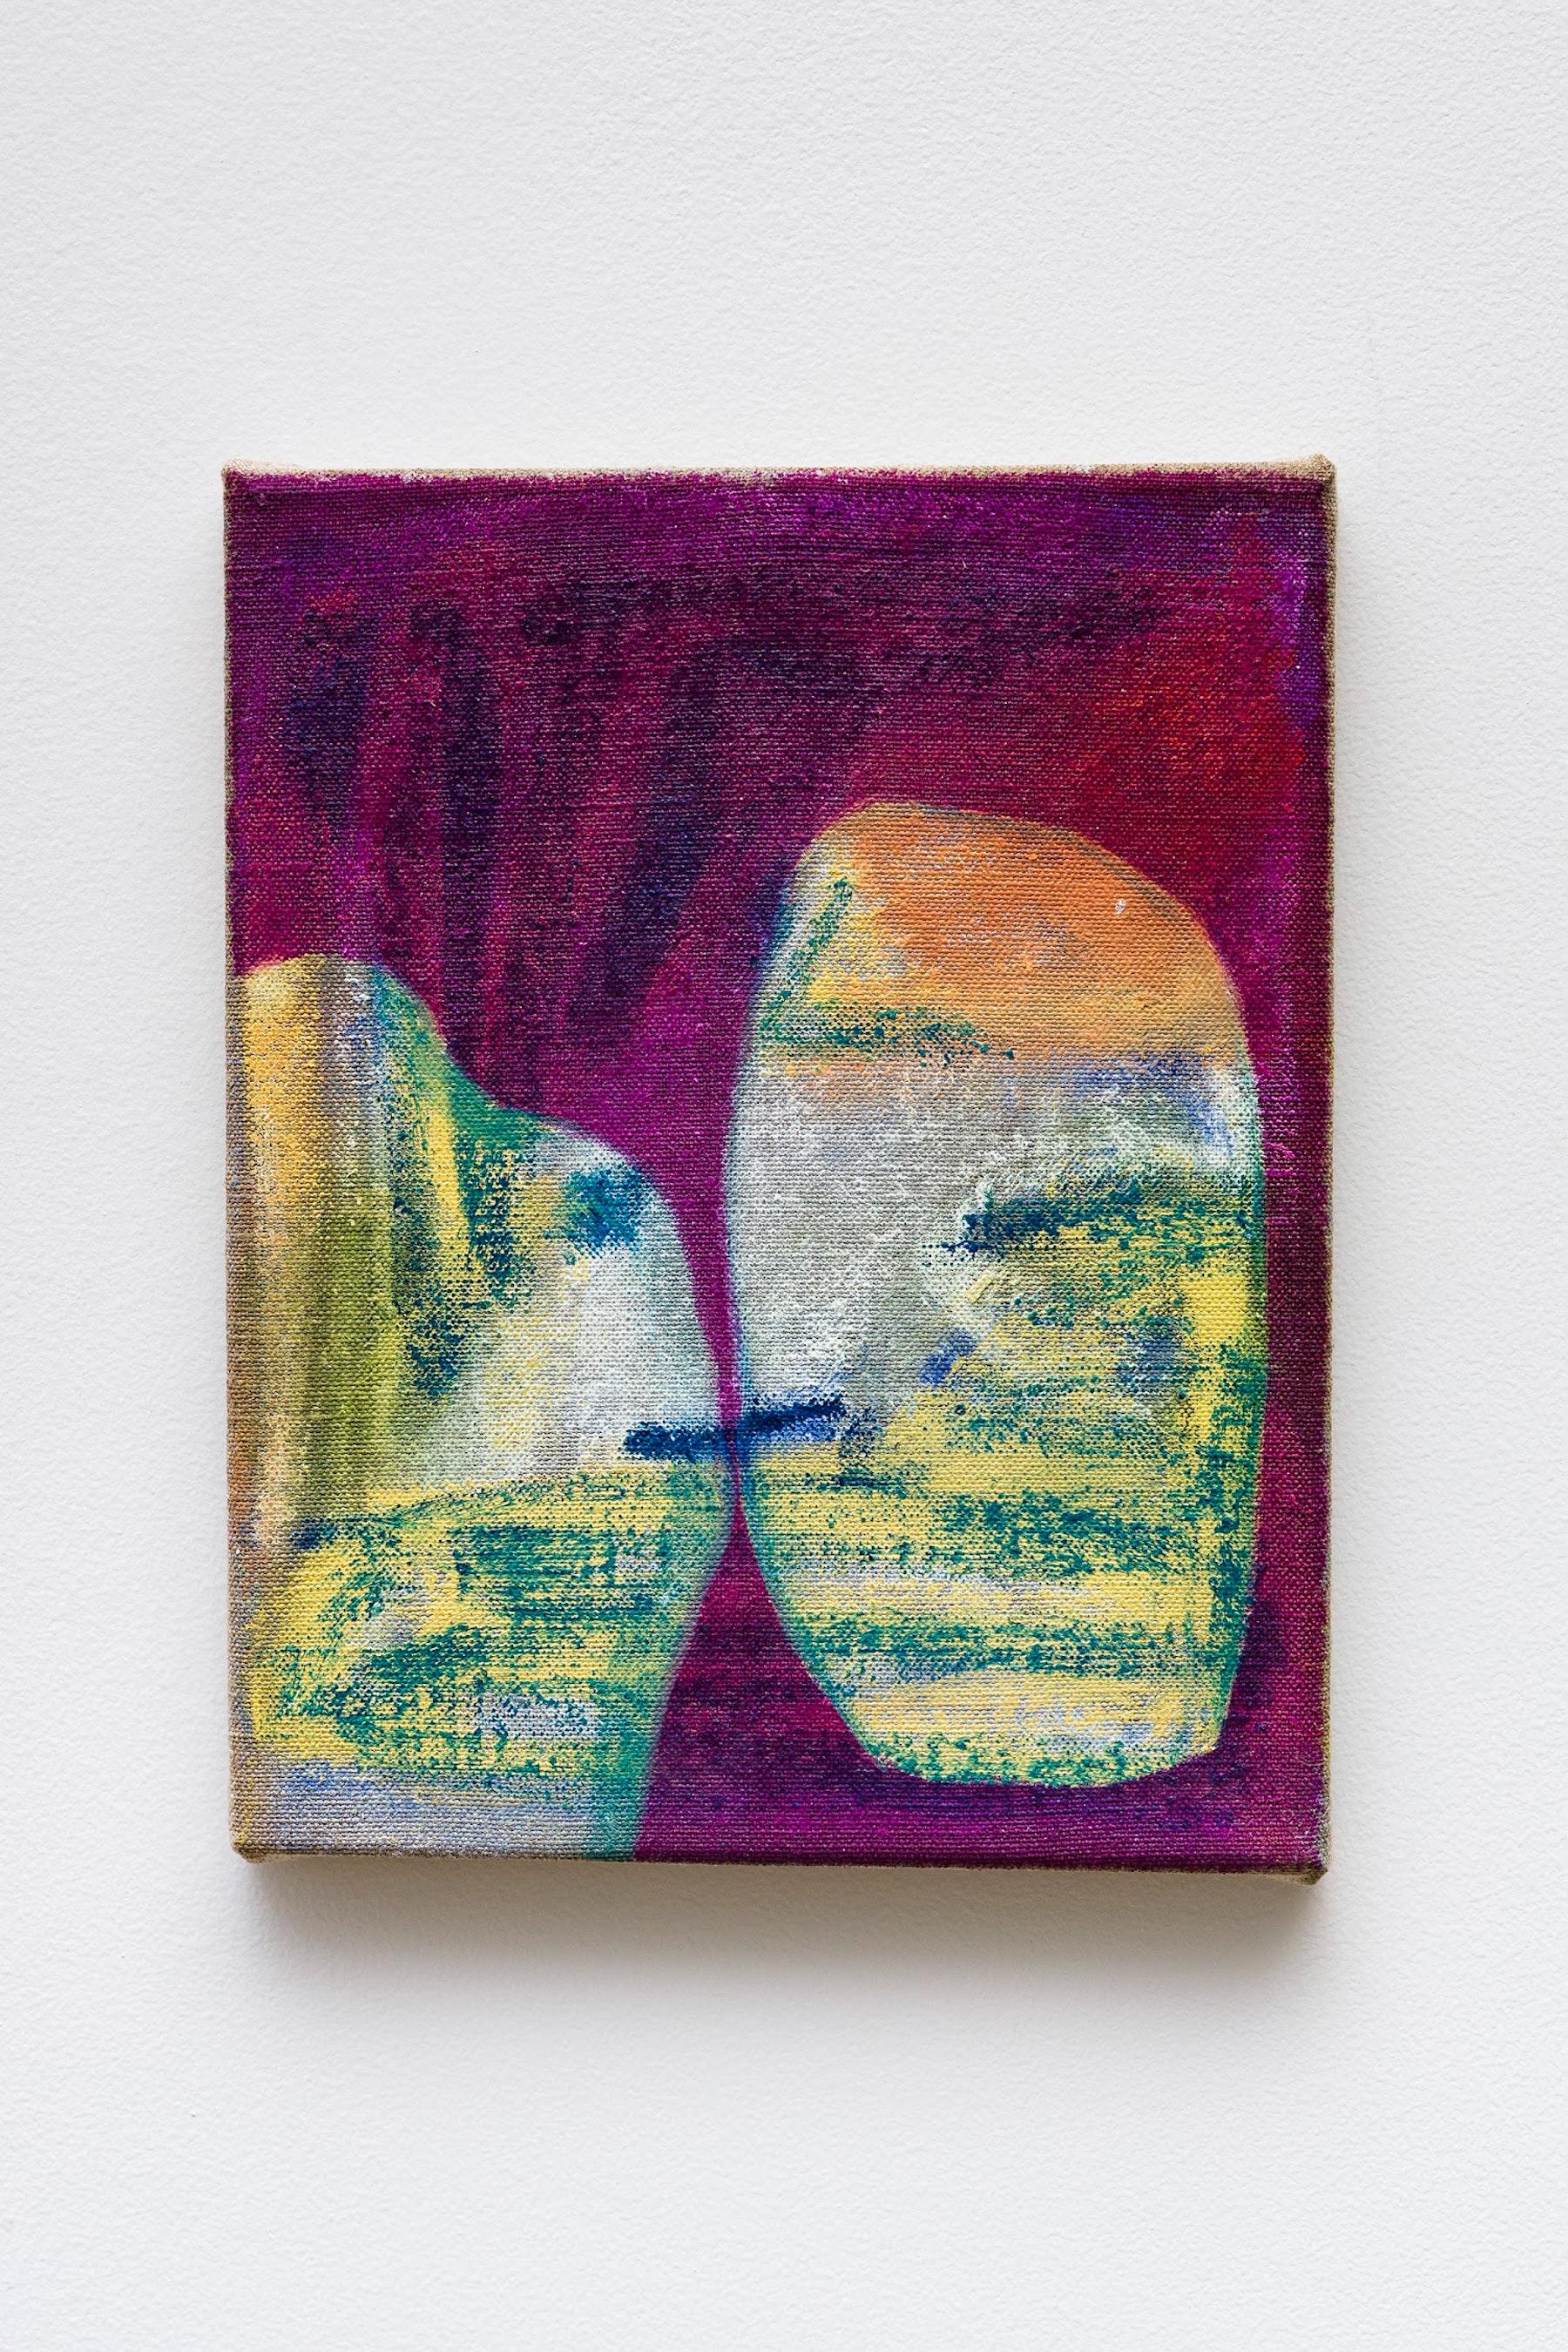 "Monique Van Genderen ""Untitled,"" 2020 Oil on linen 10 x 8"" [HxW] (25.4 x 20.32 cm) Inventory #VGE397 Courtesy of the artist and Vielmetter Los Angeles Photo credit: Jeff Mclane"